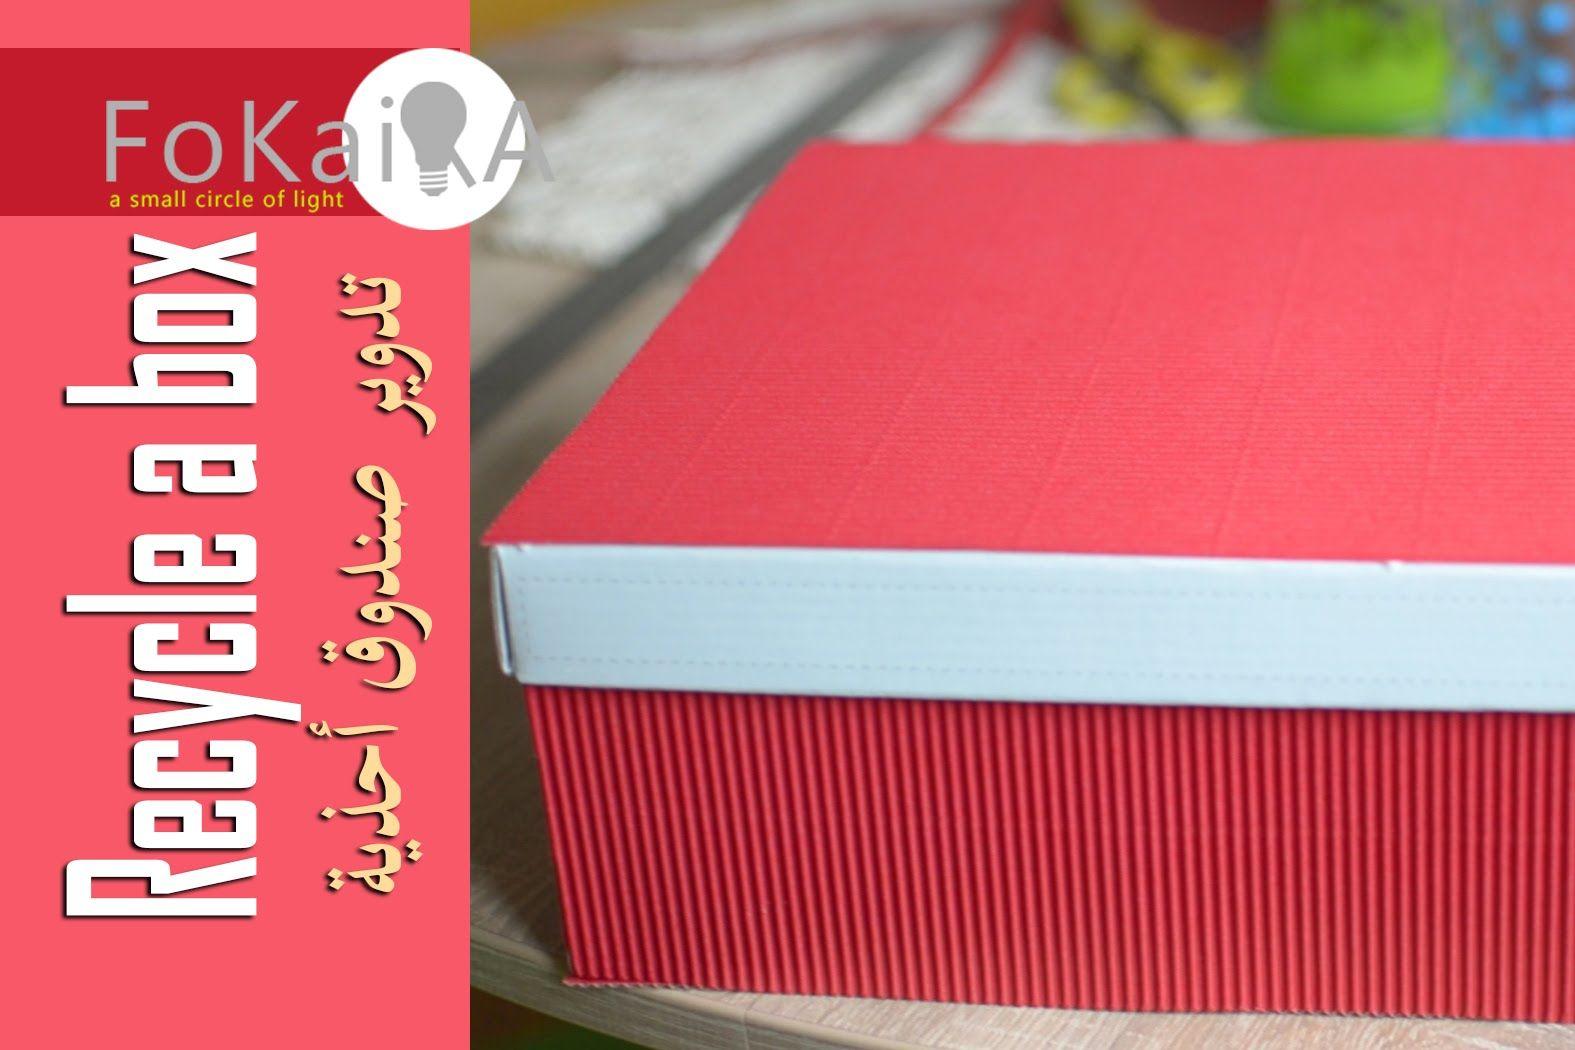 Recycling Of Carton Boxes الفكيرة 18 اعادة استخدام الصناديق الكرتون Recycle Box Light Box Recycling